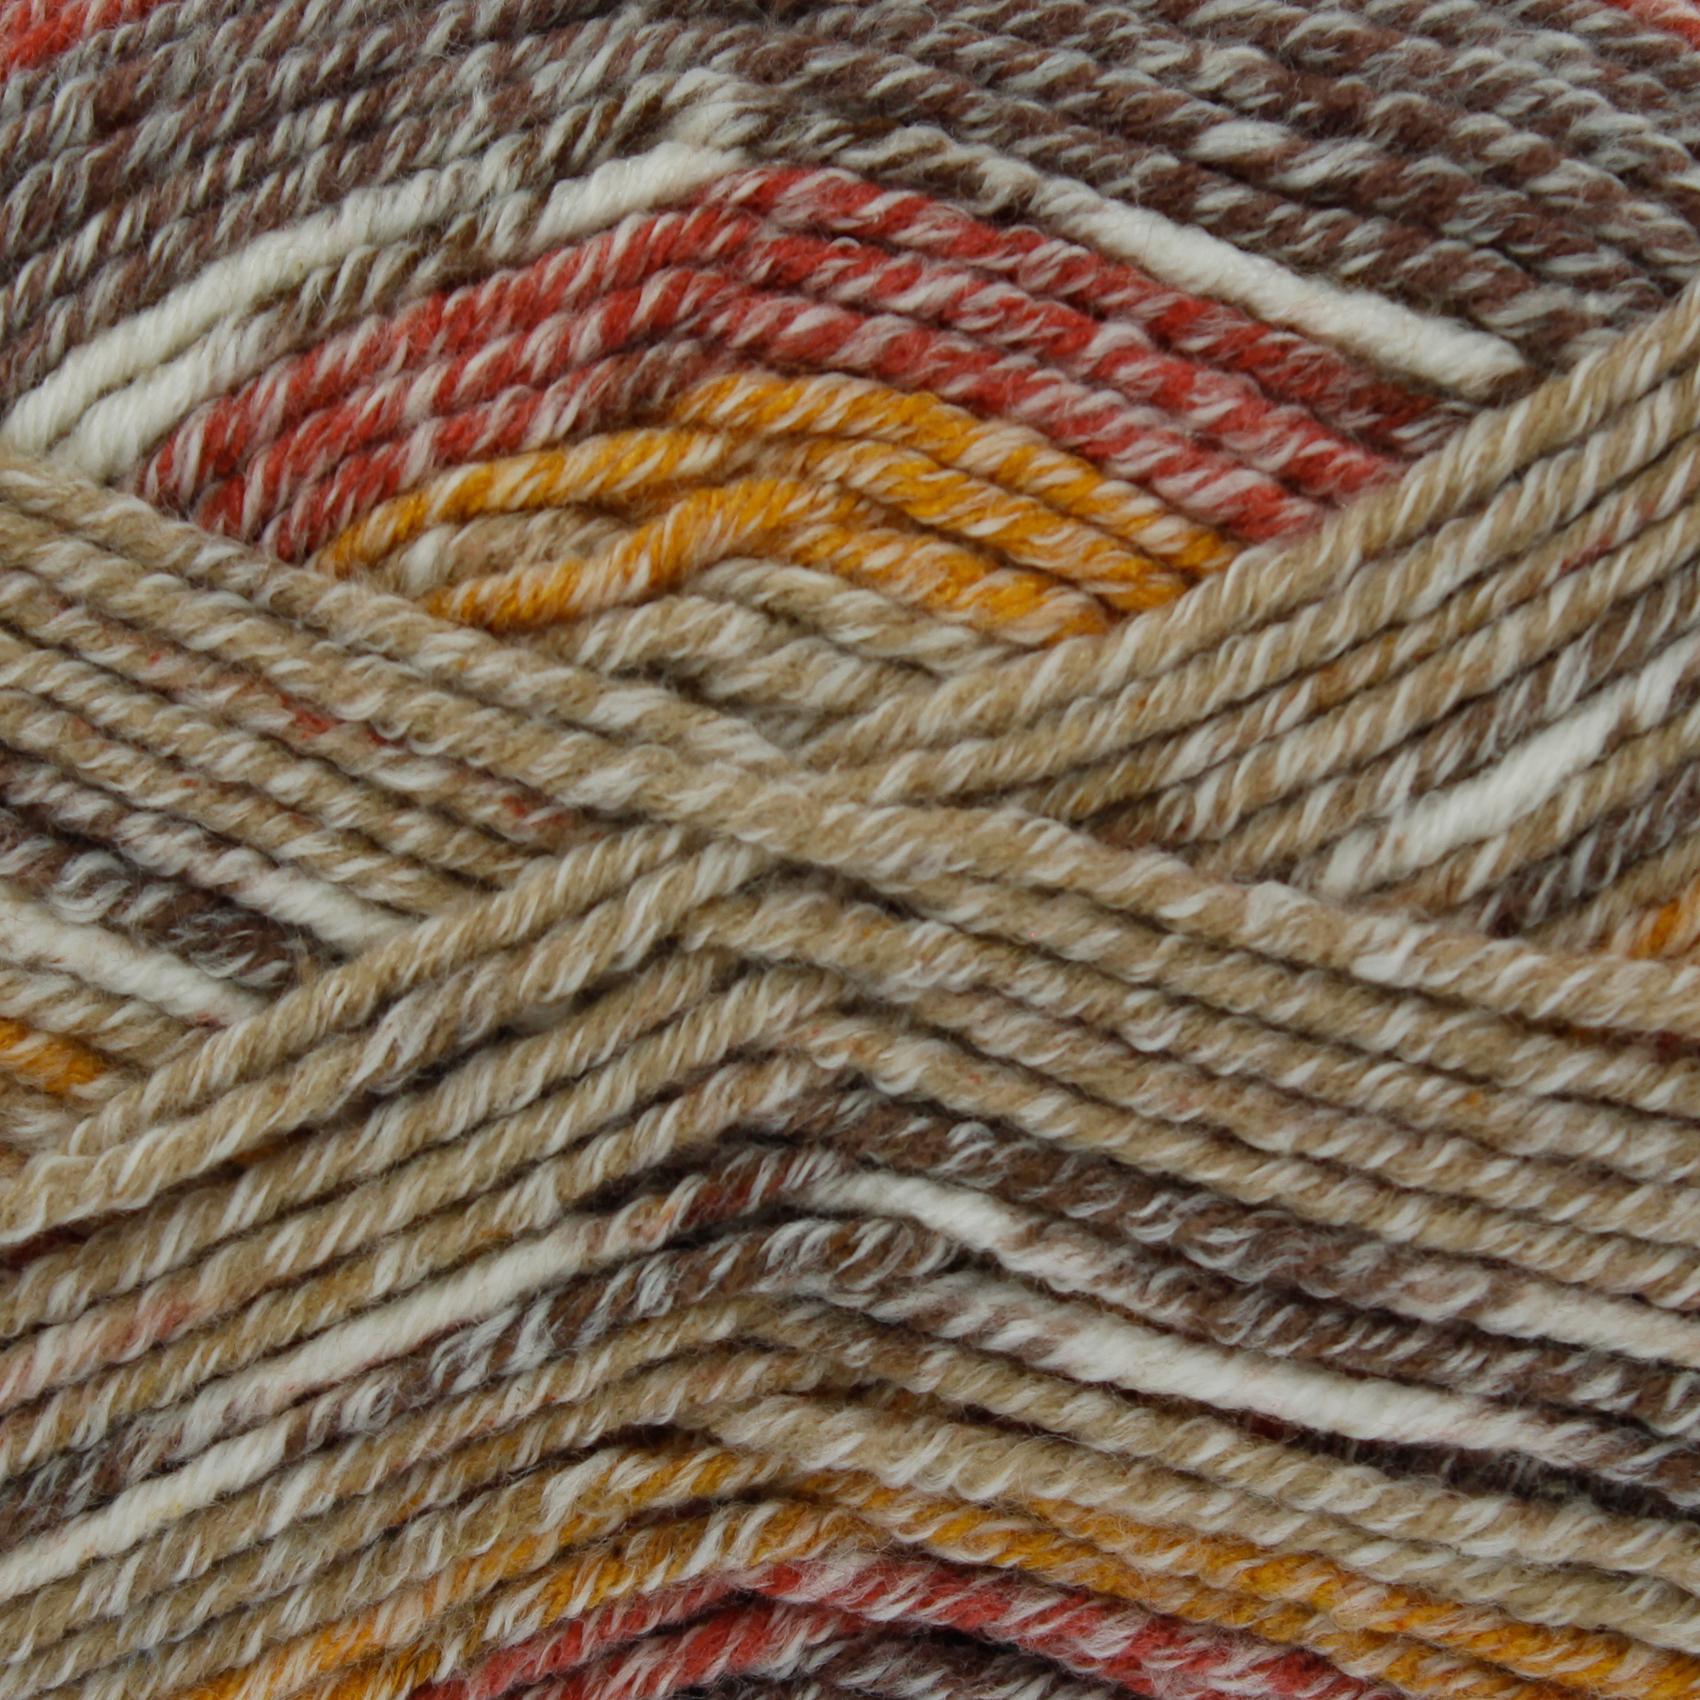 Knitting Wool Uk Only : King cole drifter chunky knitting yarn super soft acrylic